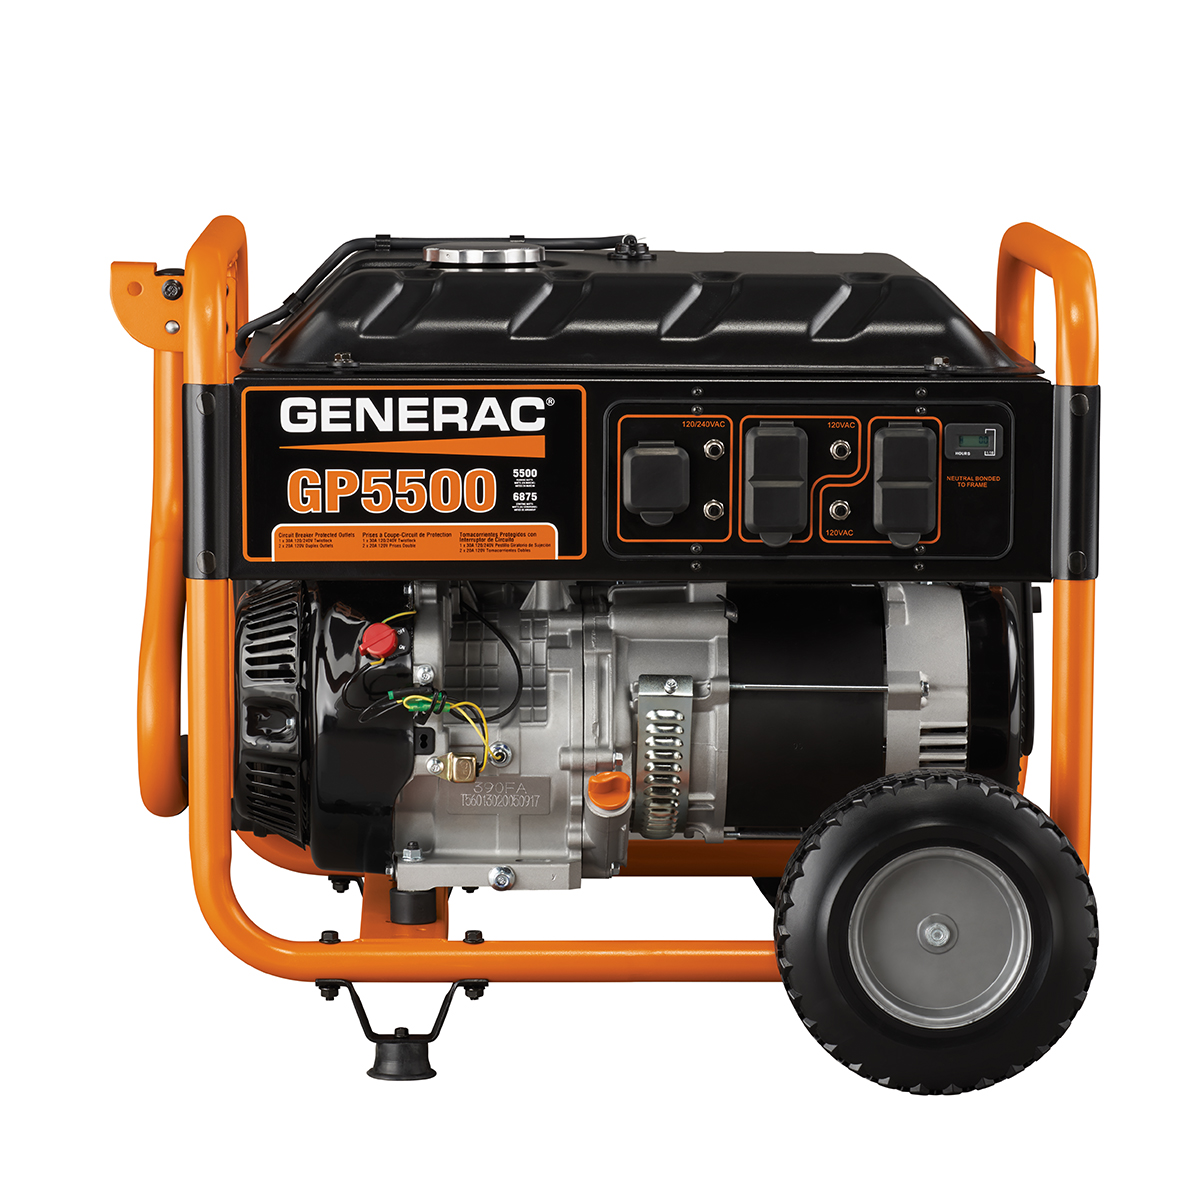 generac 5939 5500 watt gasoline powered portable generator 49 rh walmart com Generator Installation Diagram Generator Installation Diagram